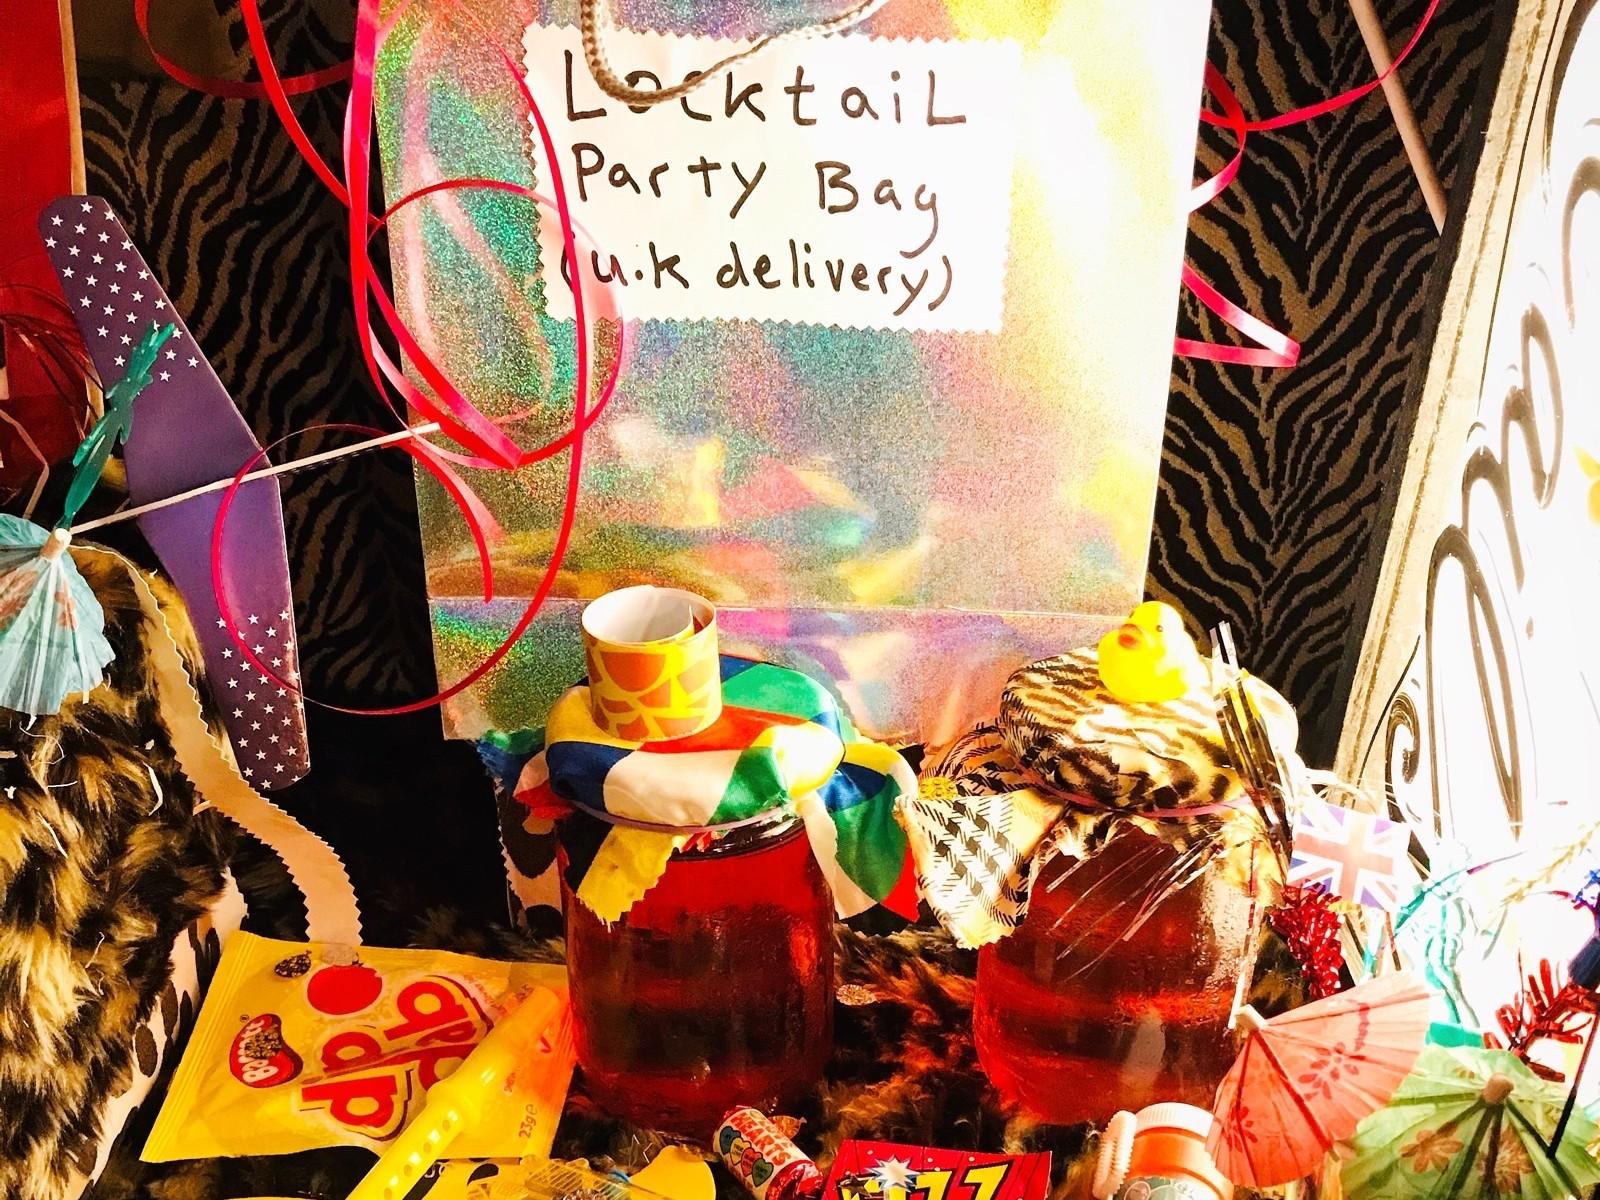 little nan's bar locktail party bag